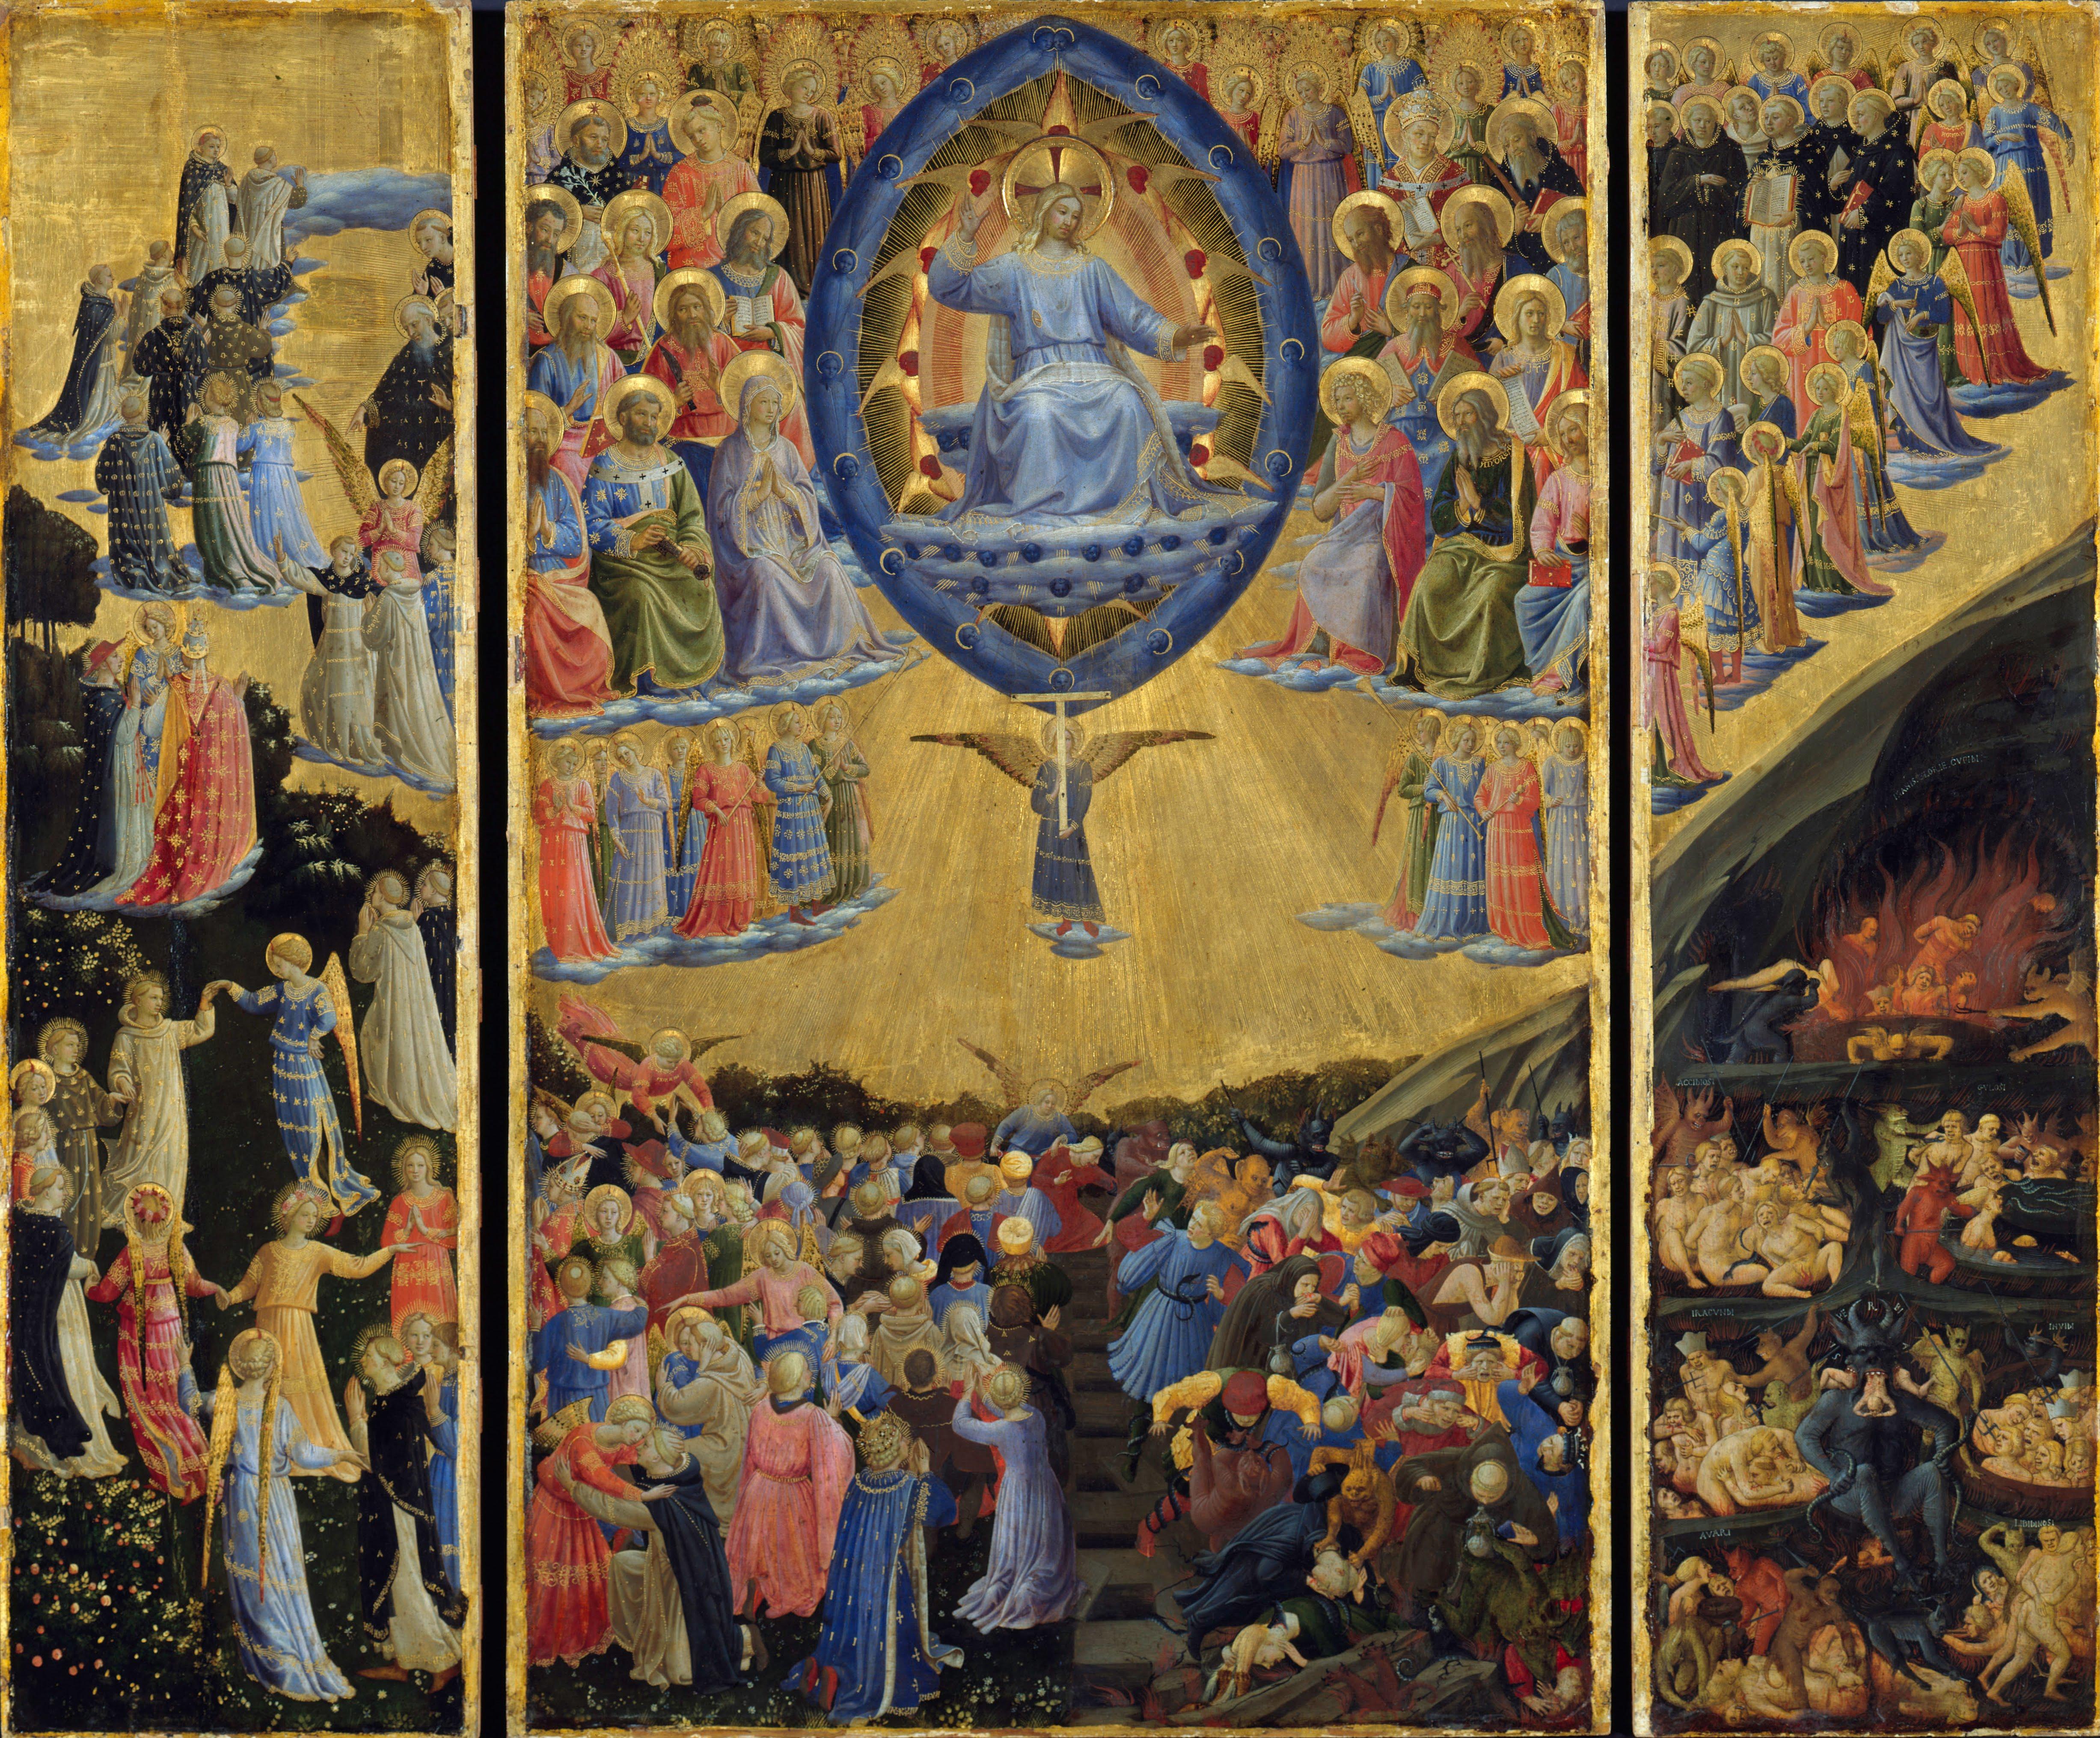 The Last Judgment, by Fra Angelico, c. 1450. Gemäldegalerie, Berlin, Germany. Via IllustratedPrayer.com